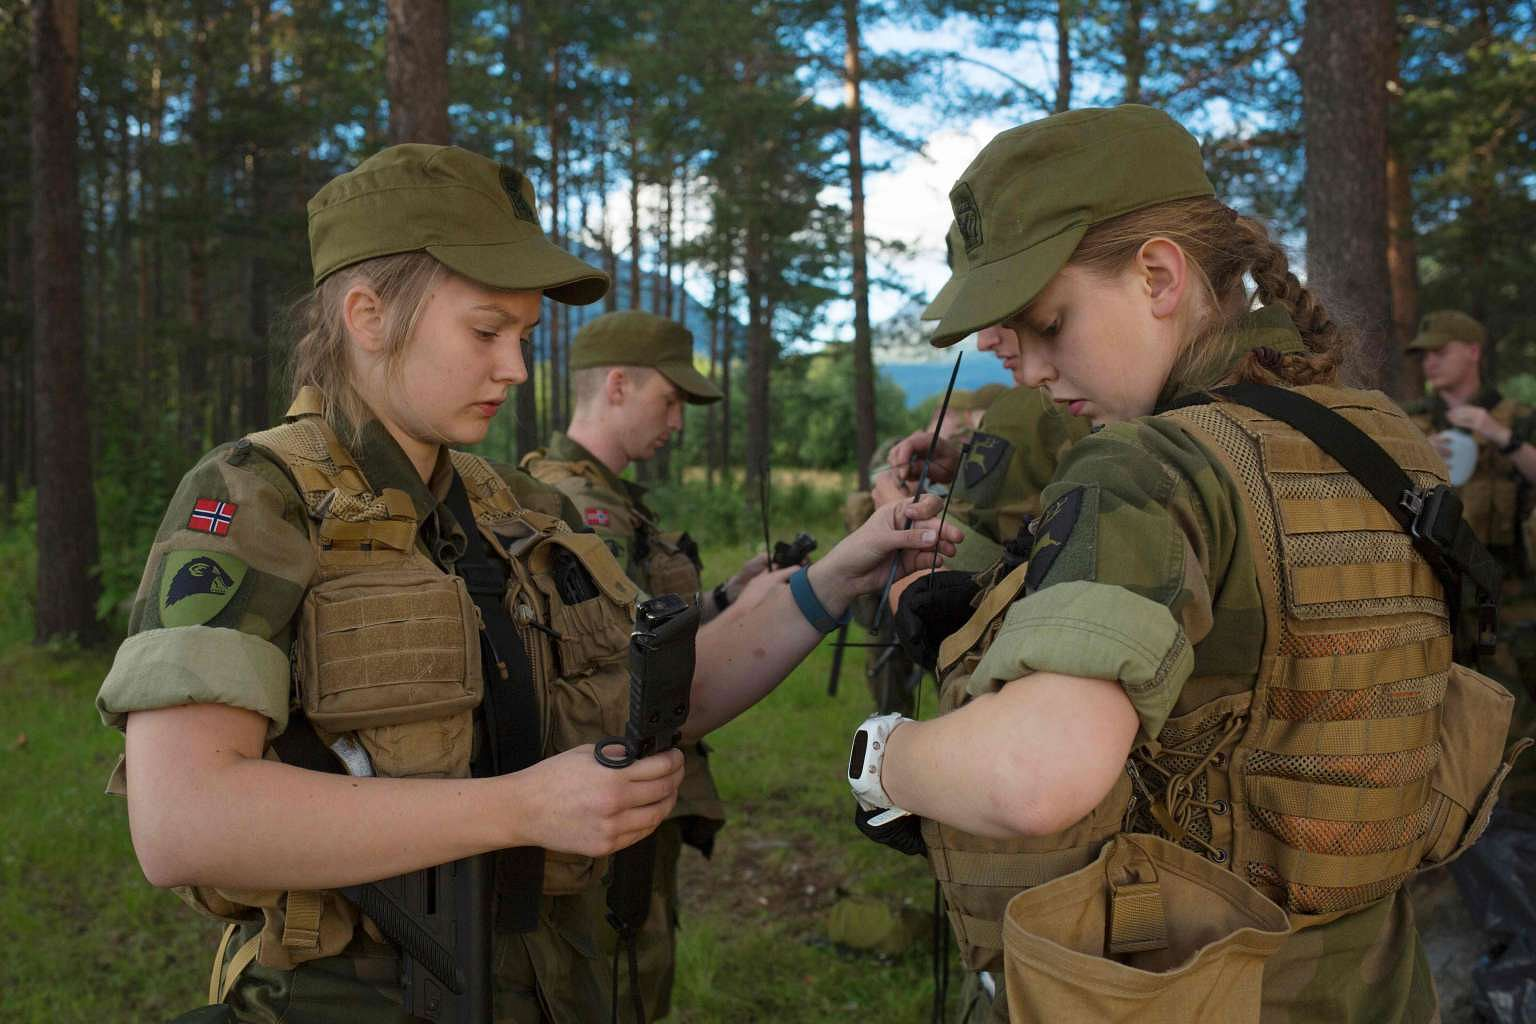 advantages of compulsory military training